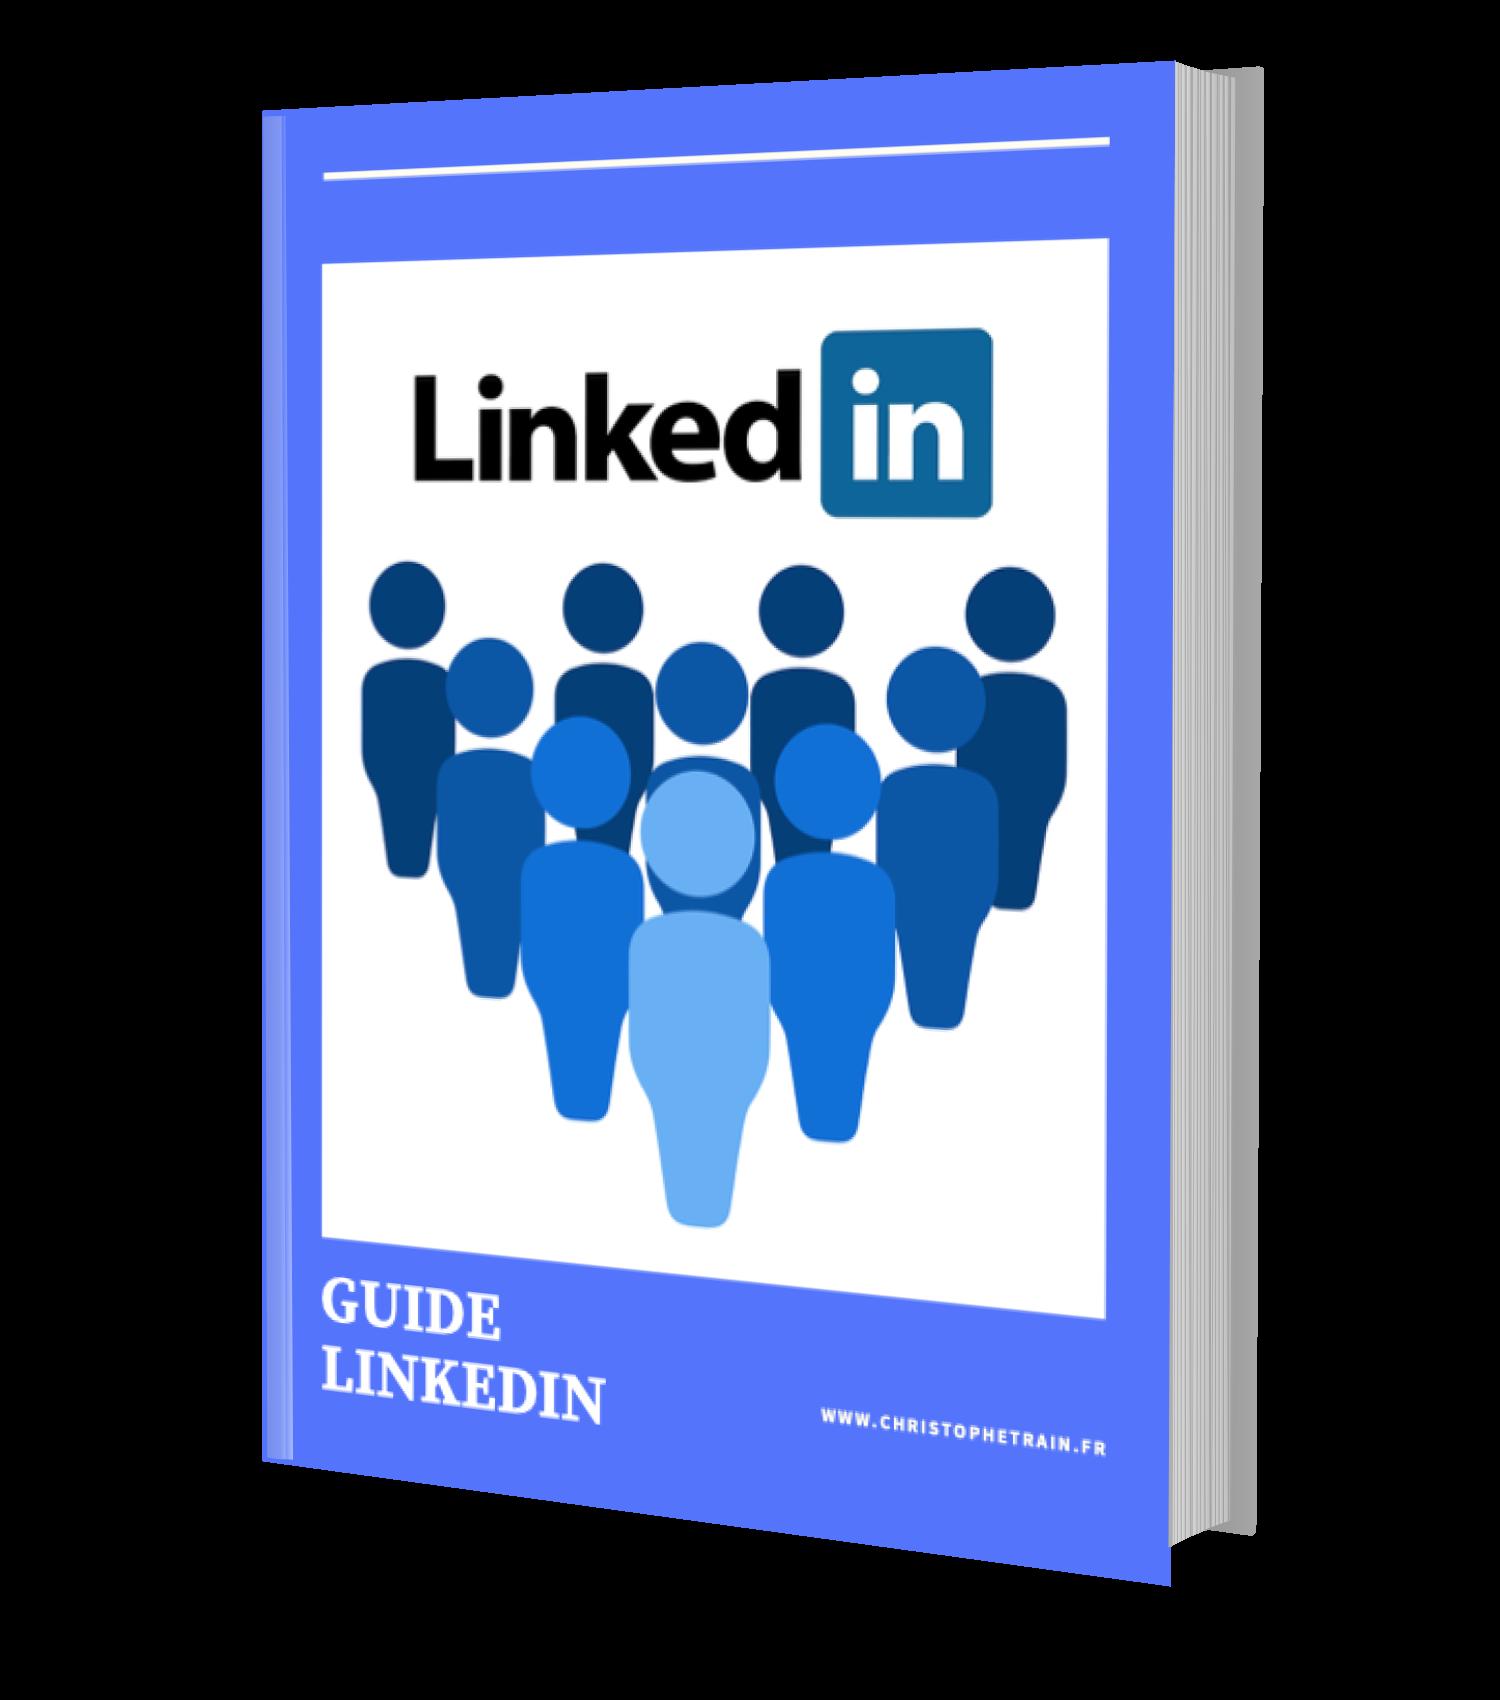 Guide LinkedIn offert